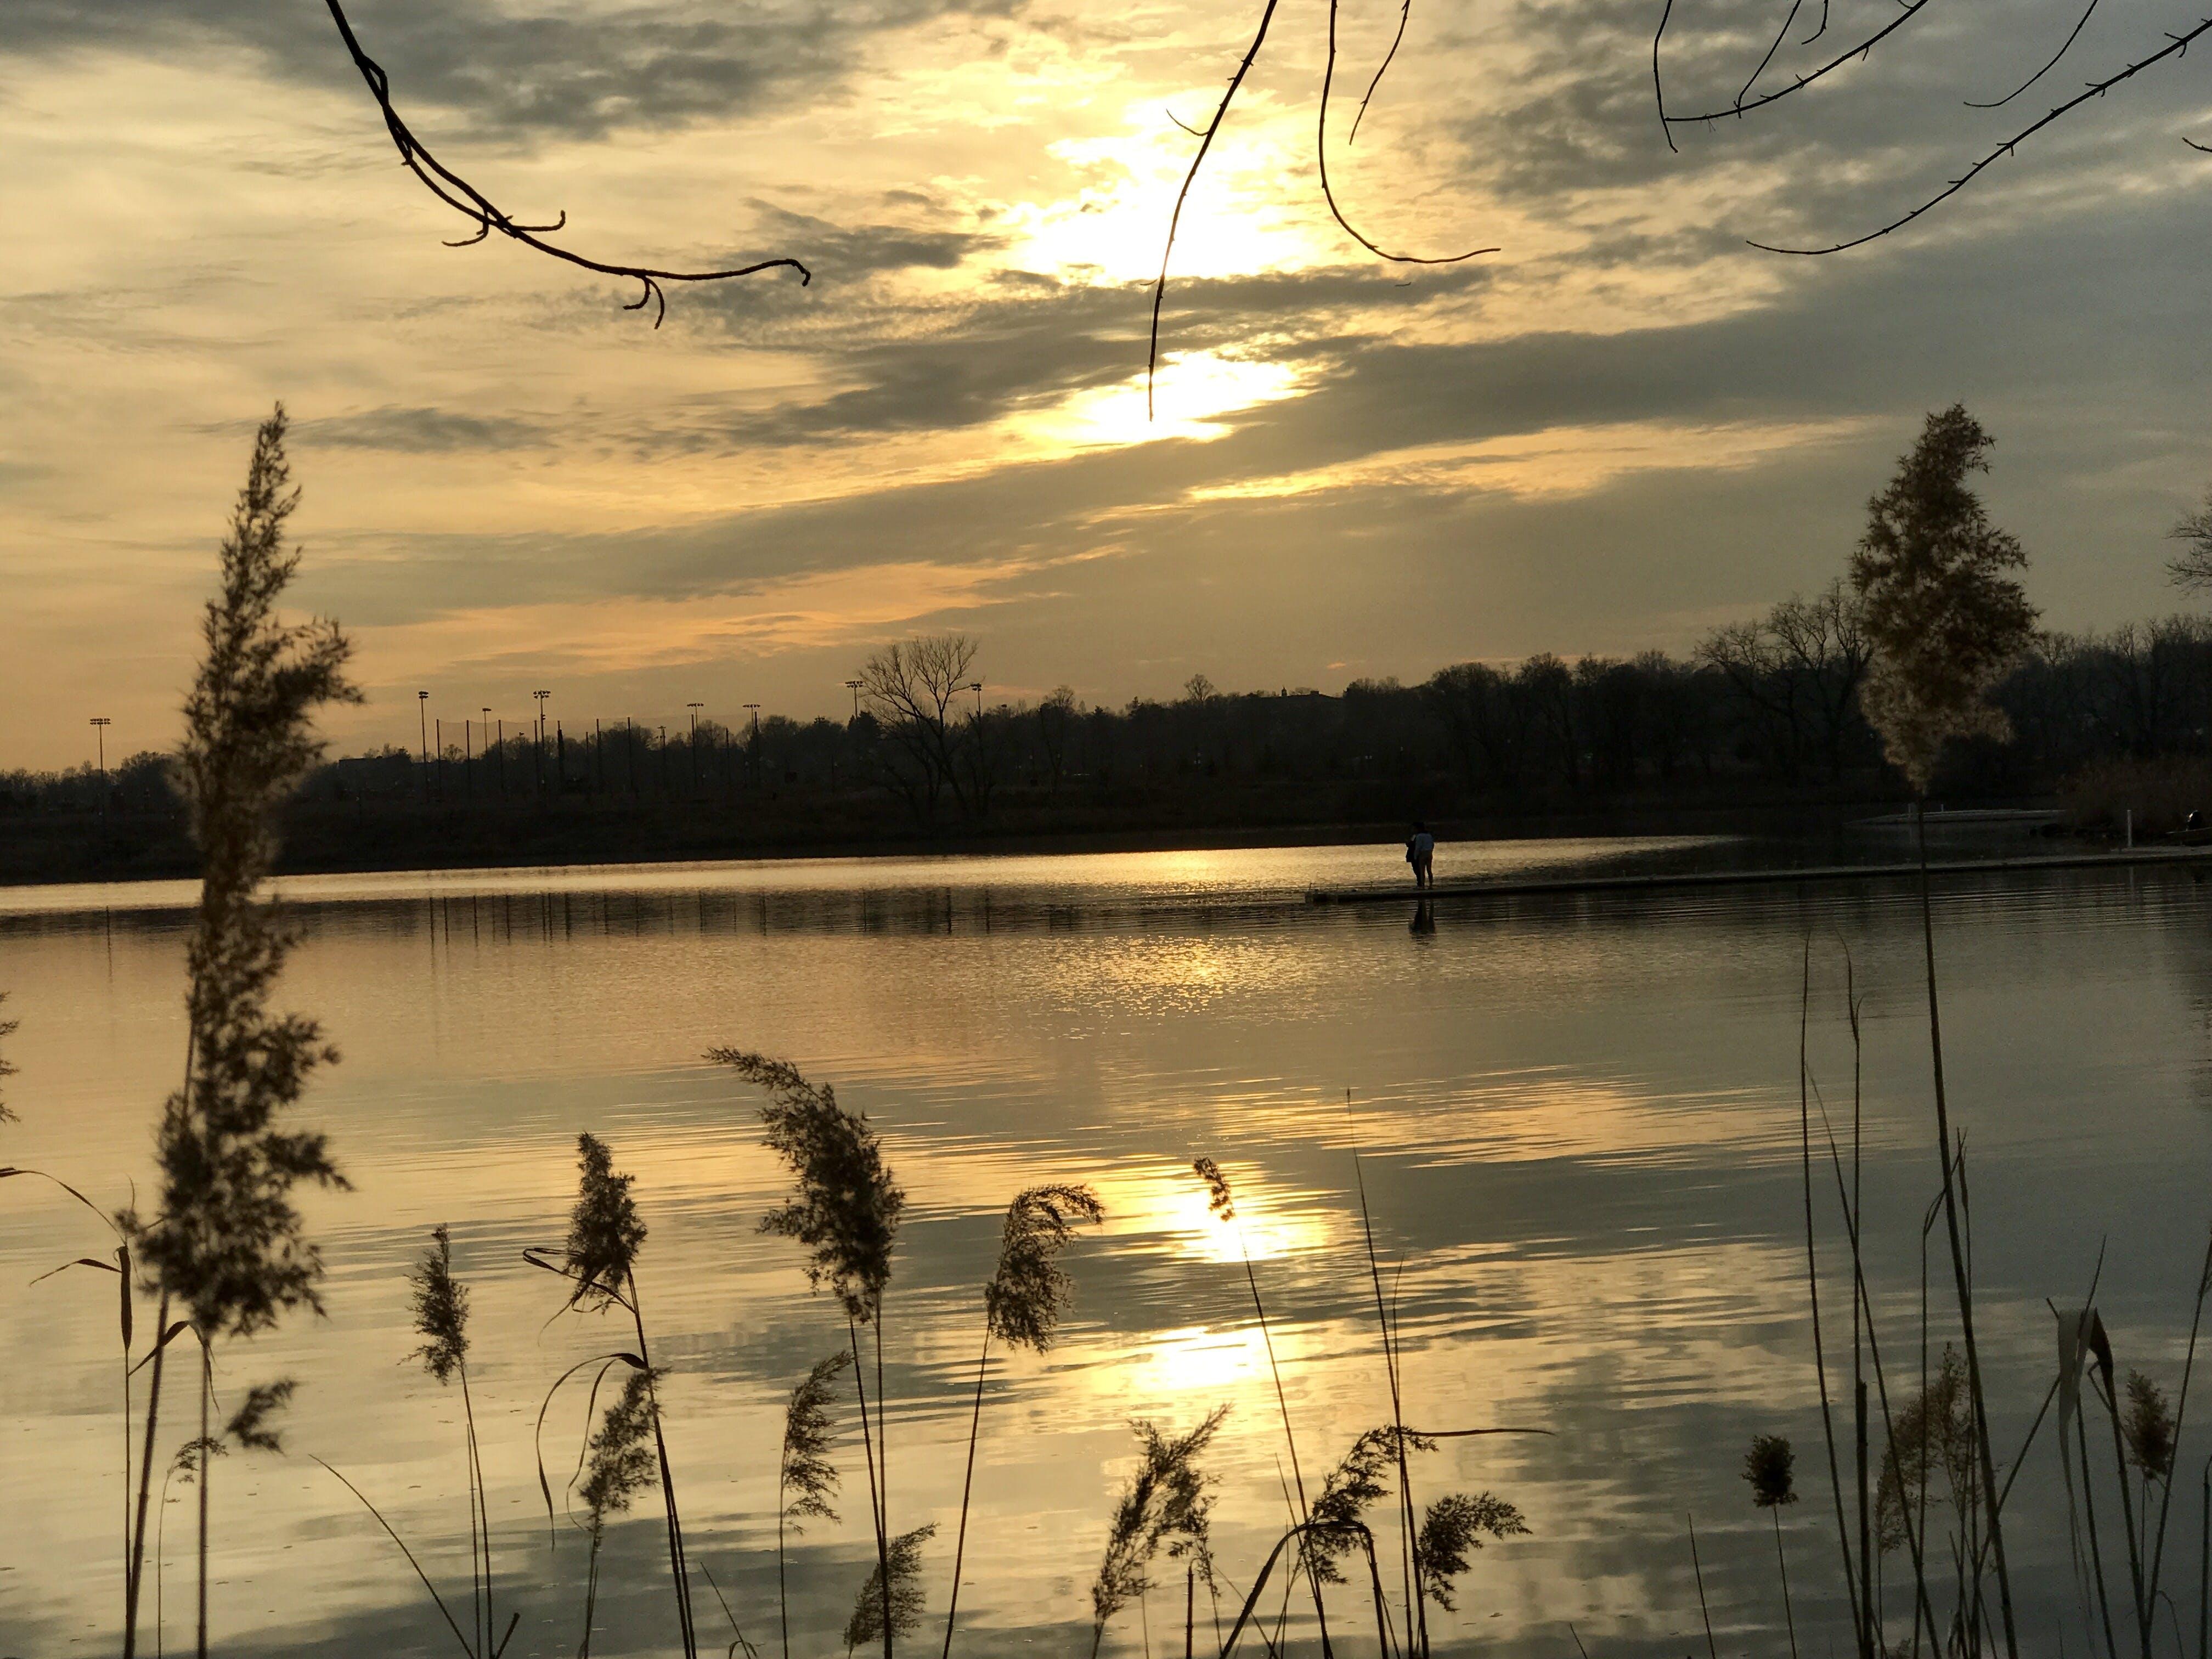 Free stock photo of nature, sunset, water